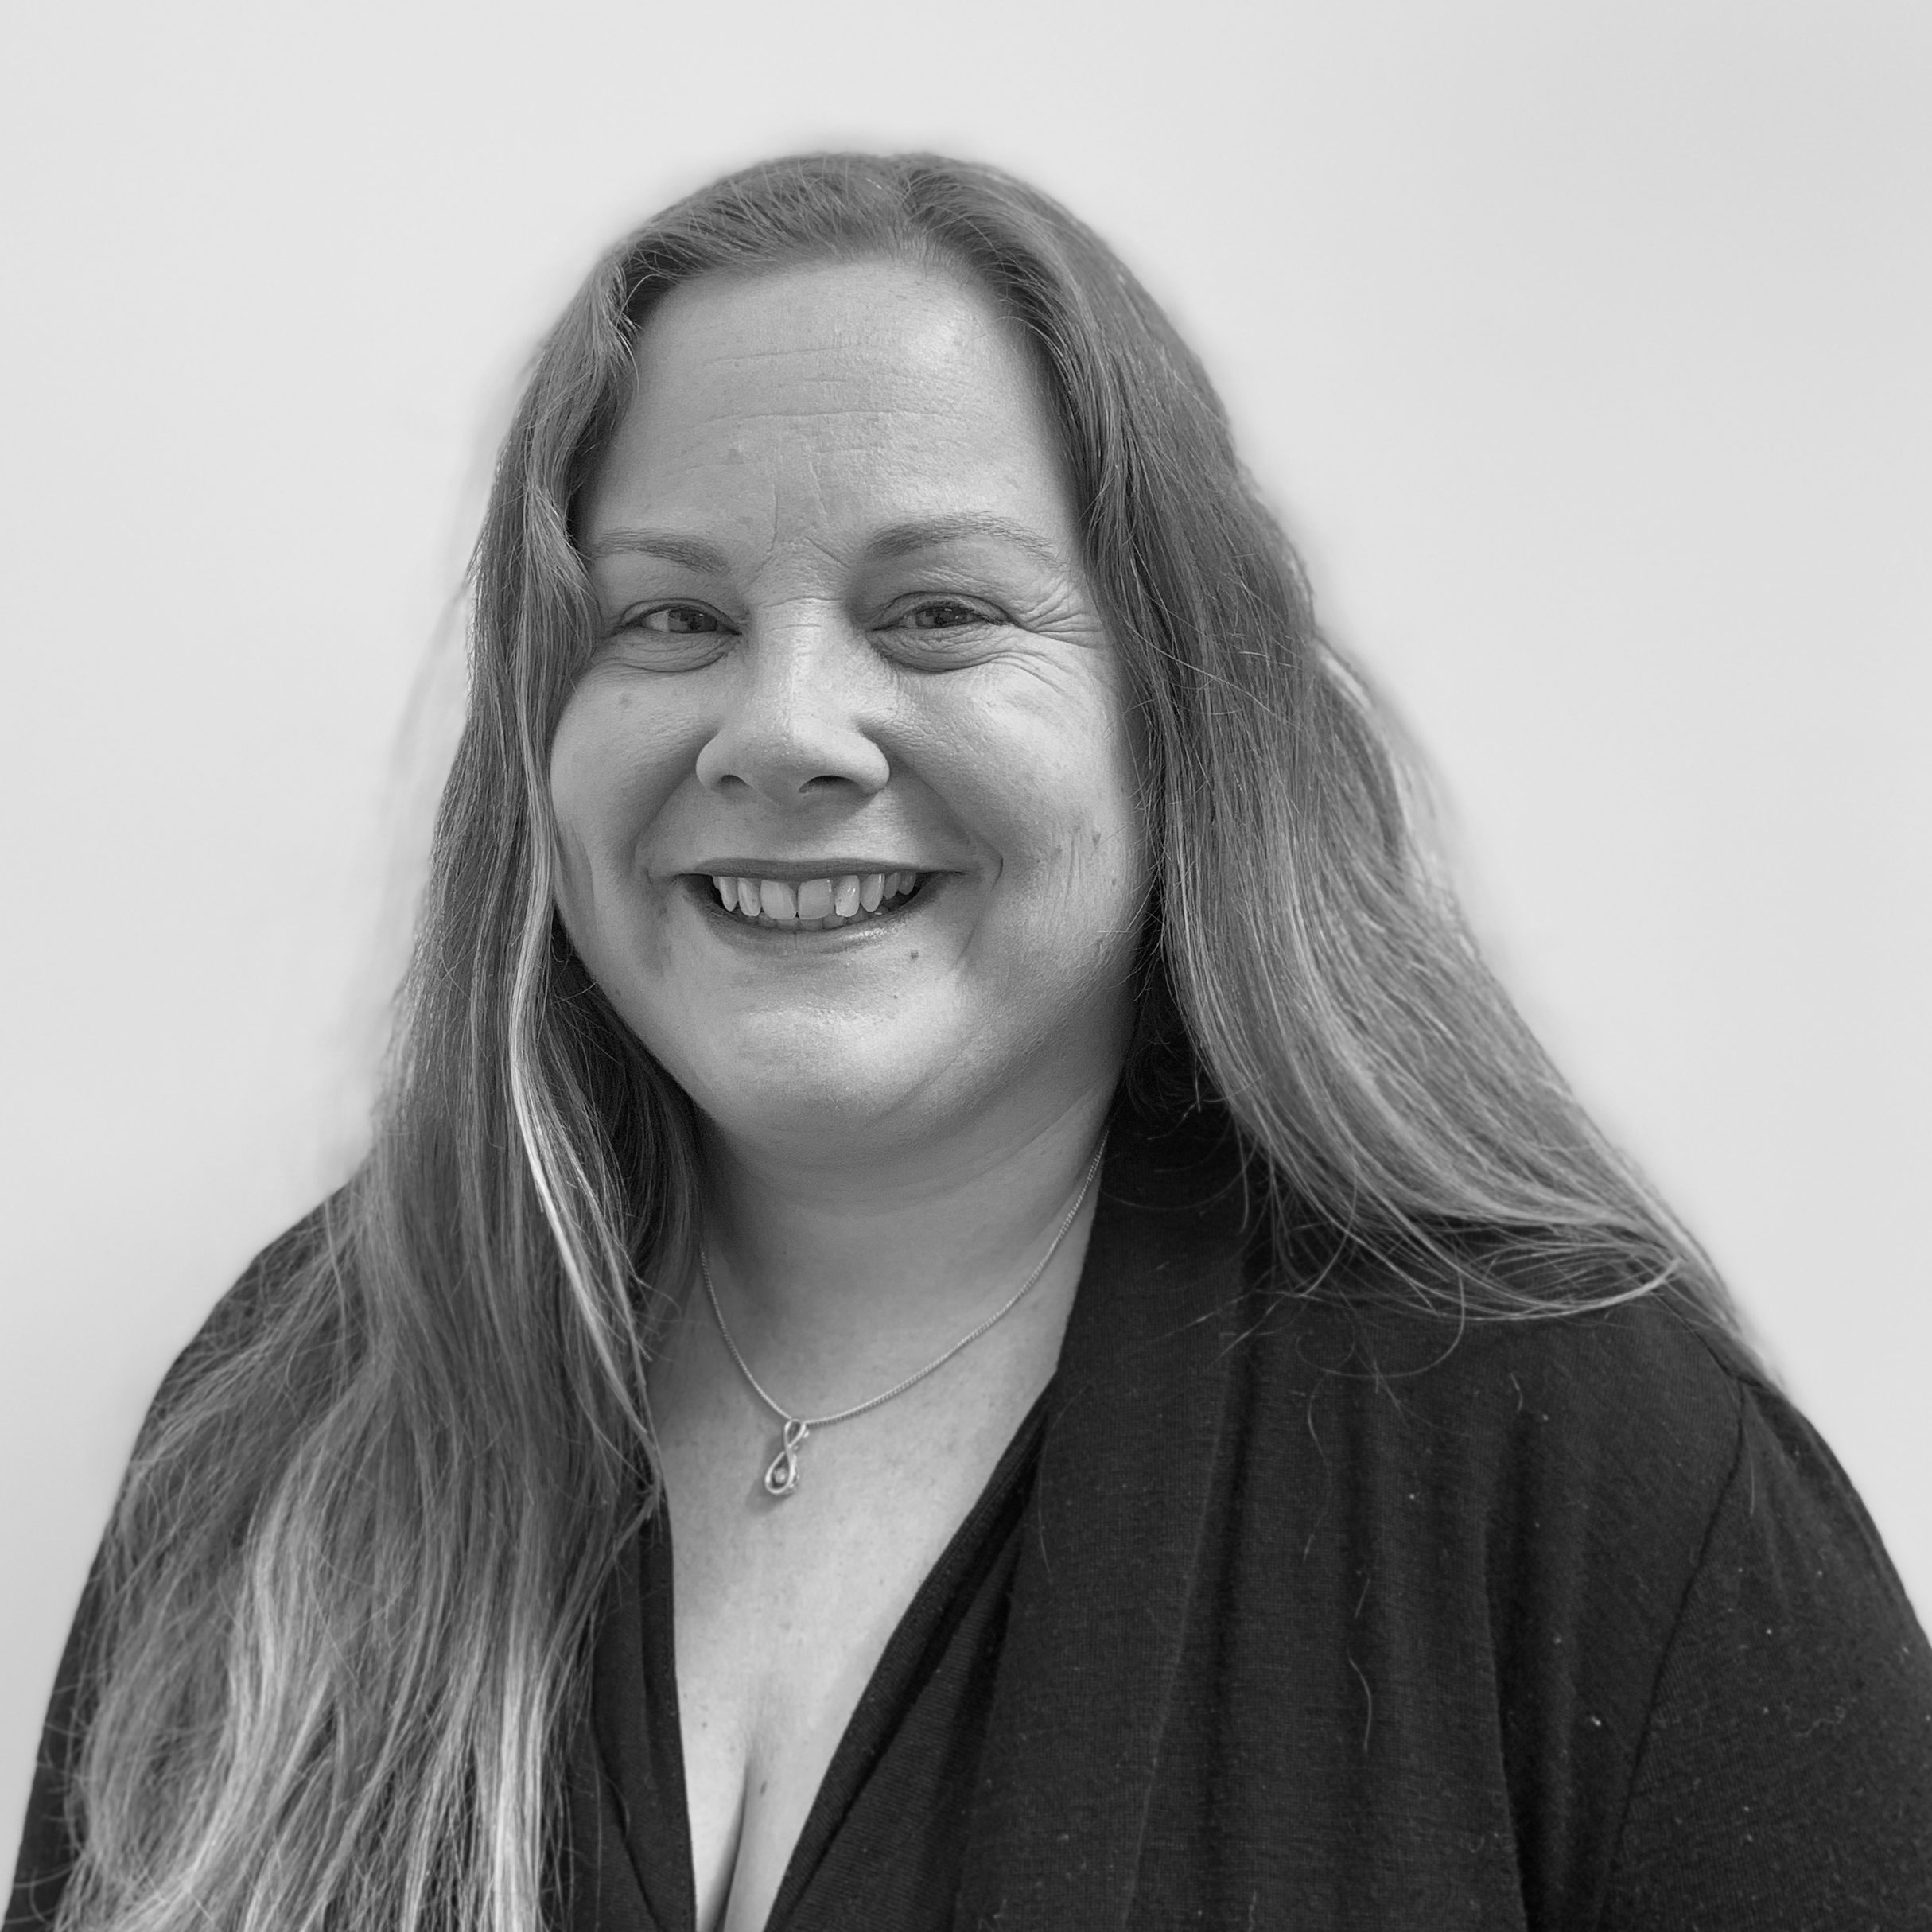 Mikaela Watts Profile